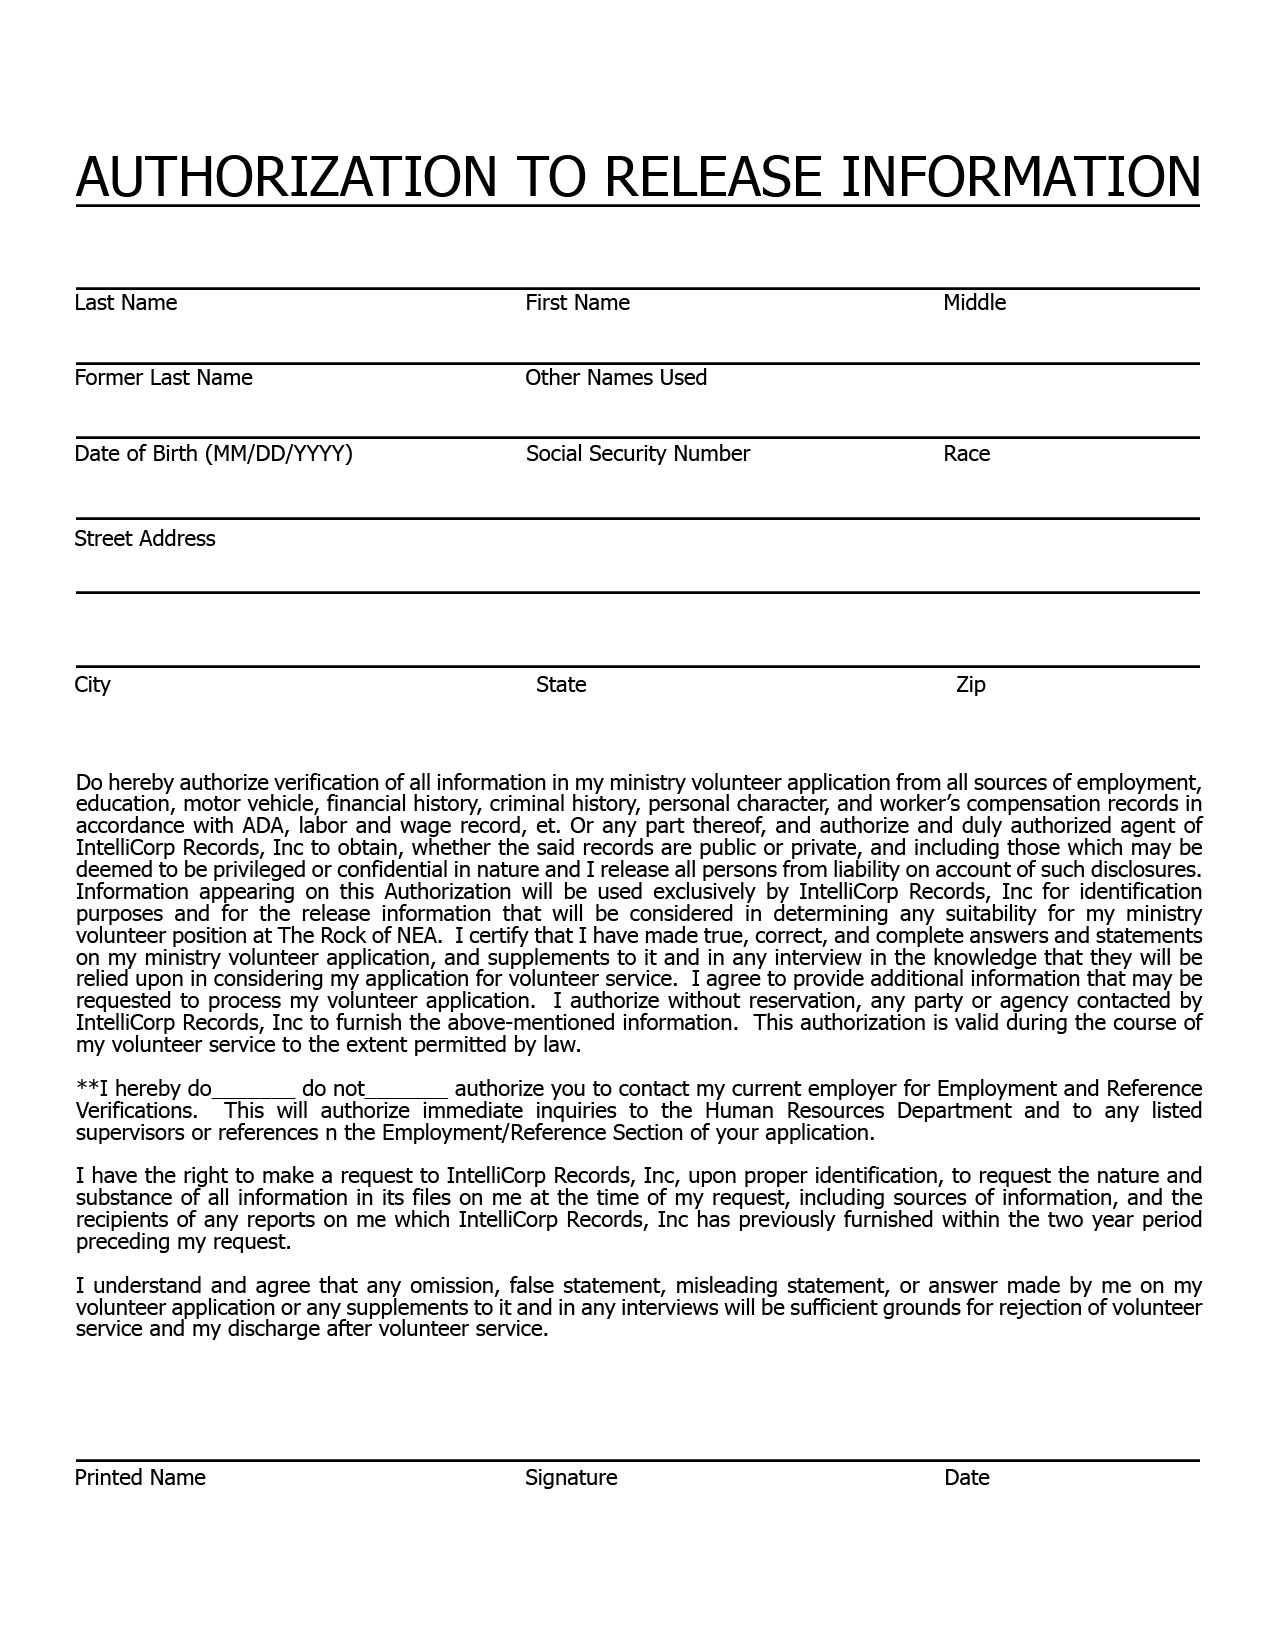 Church Nursery Background Check Form